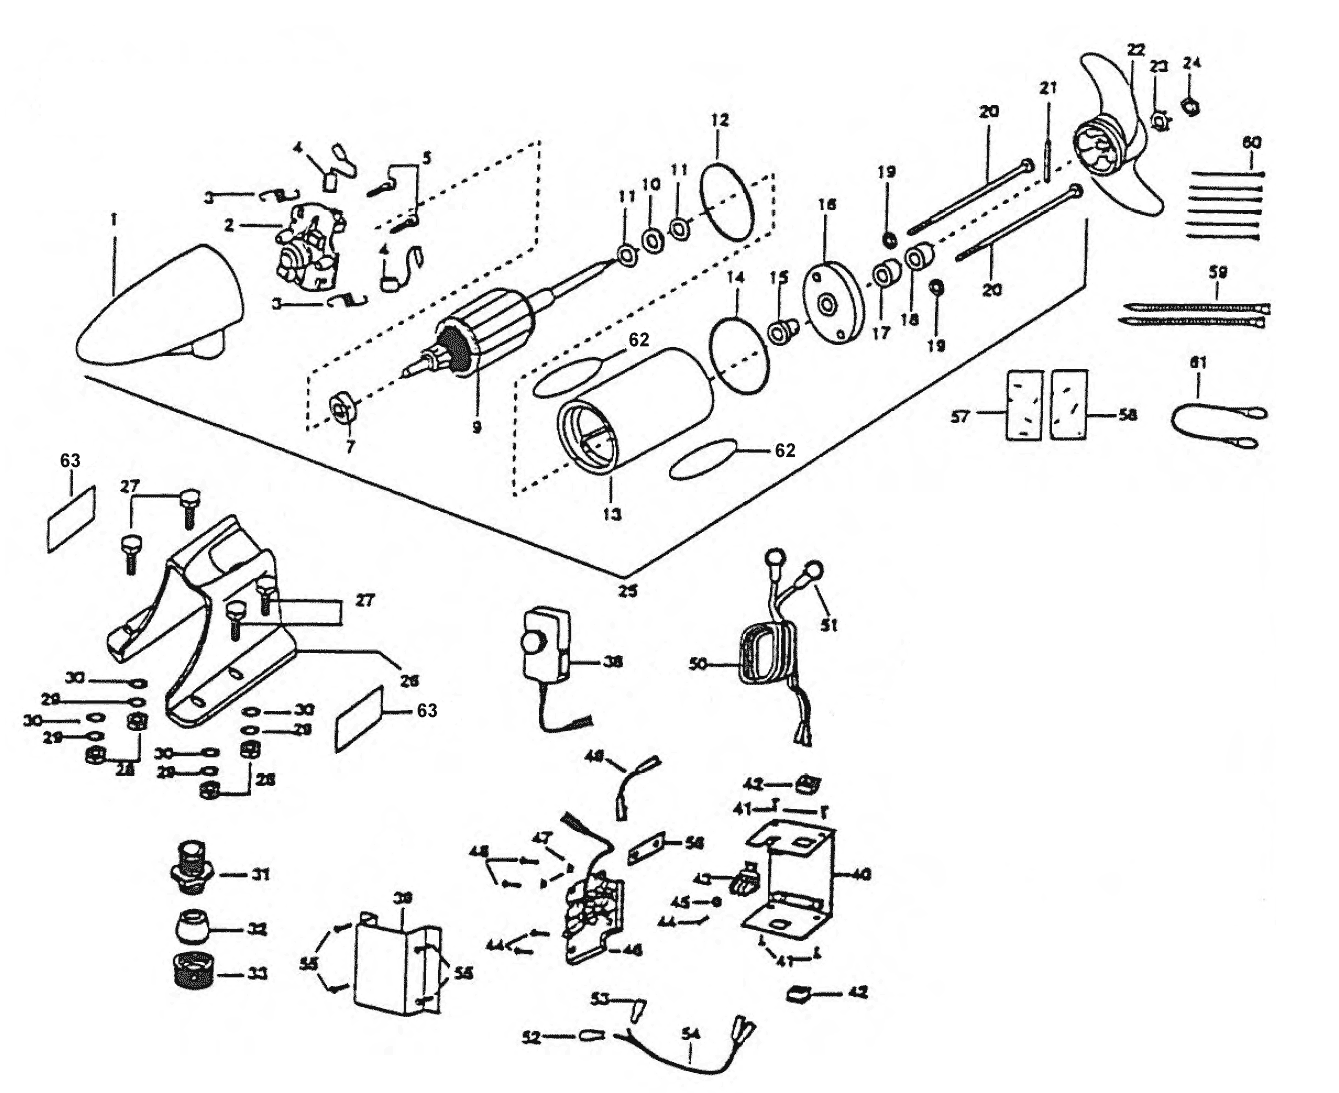 minn kota engine mount em48 parts